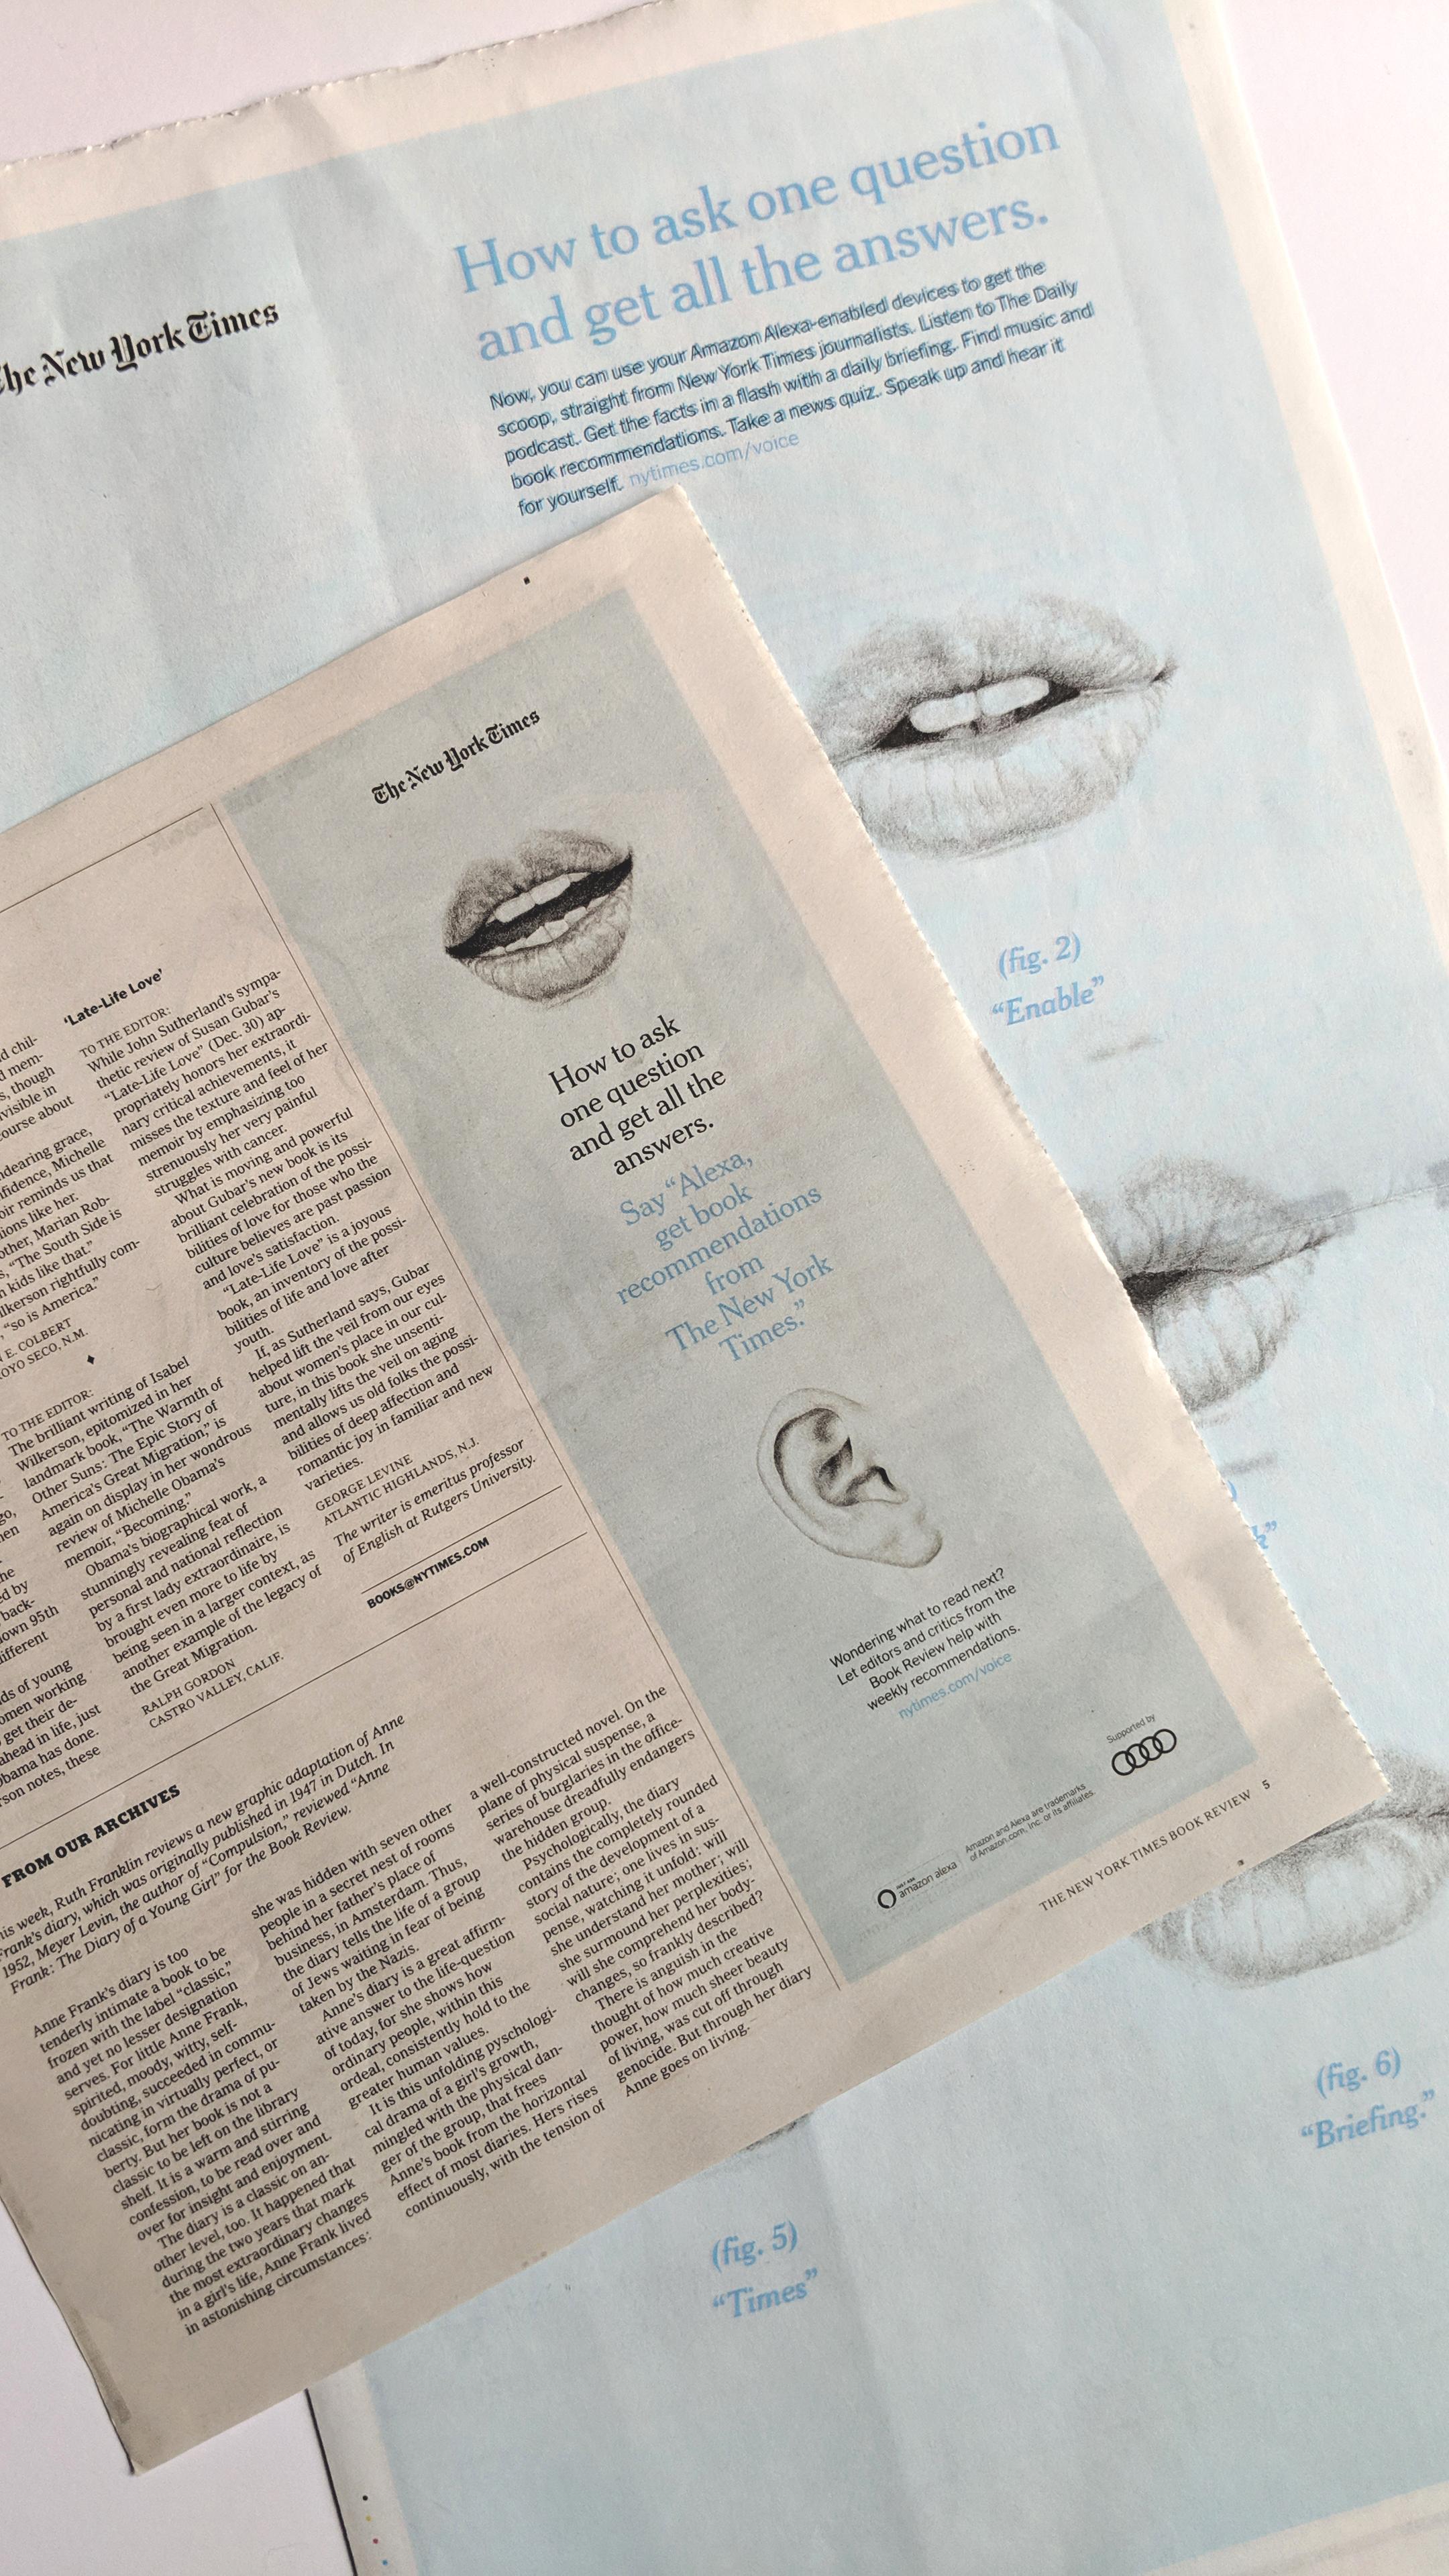 6-alexa story photo newspaperIMG_20190125_141520.jpg